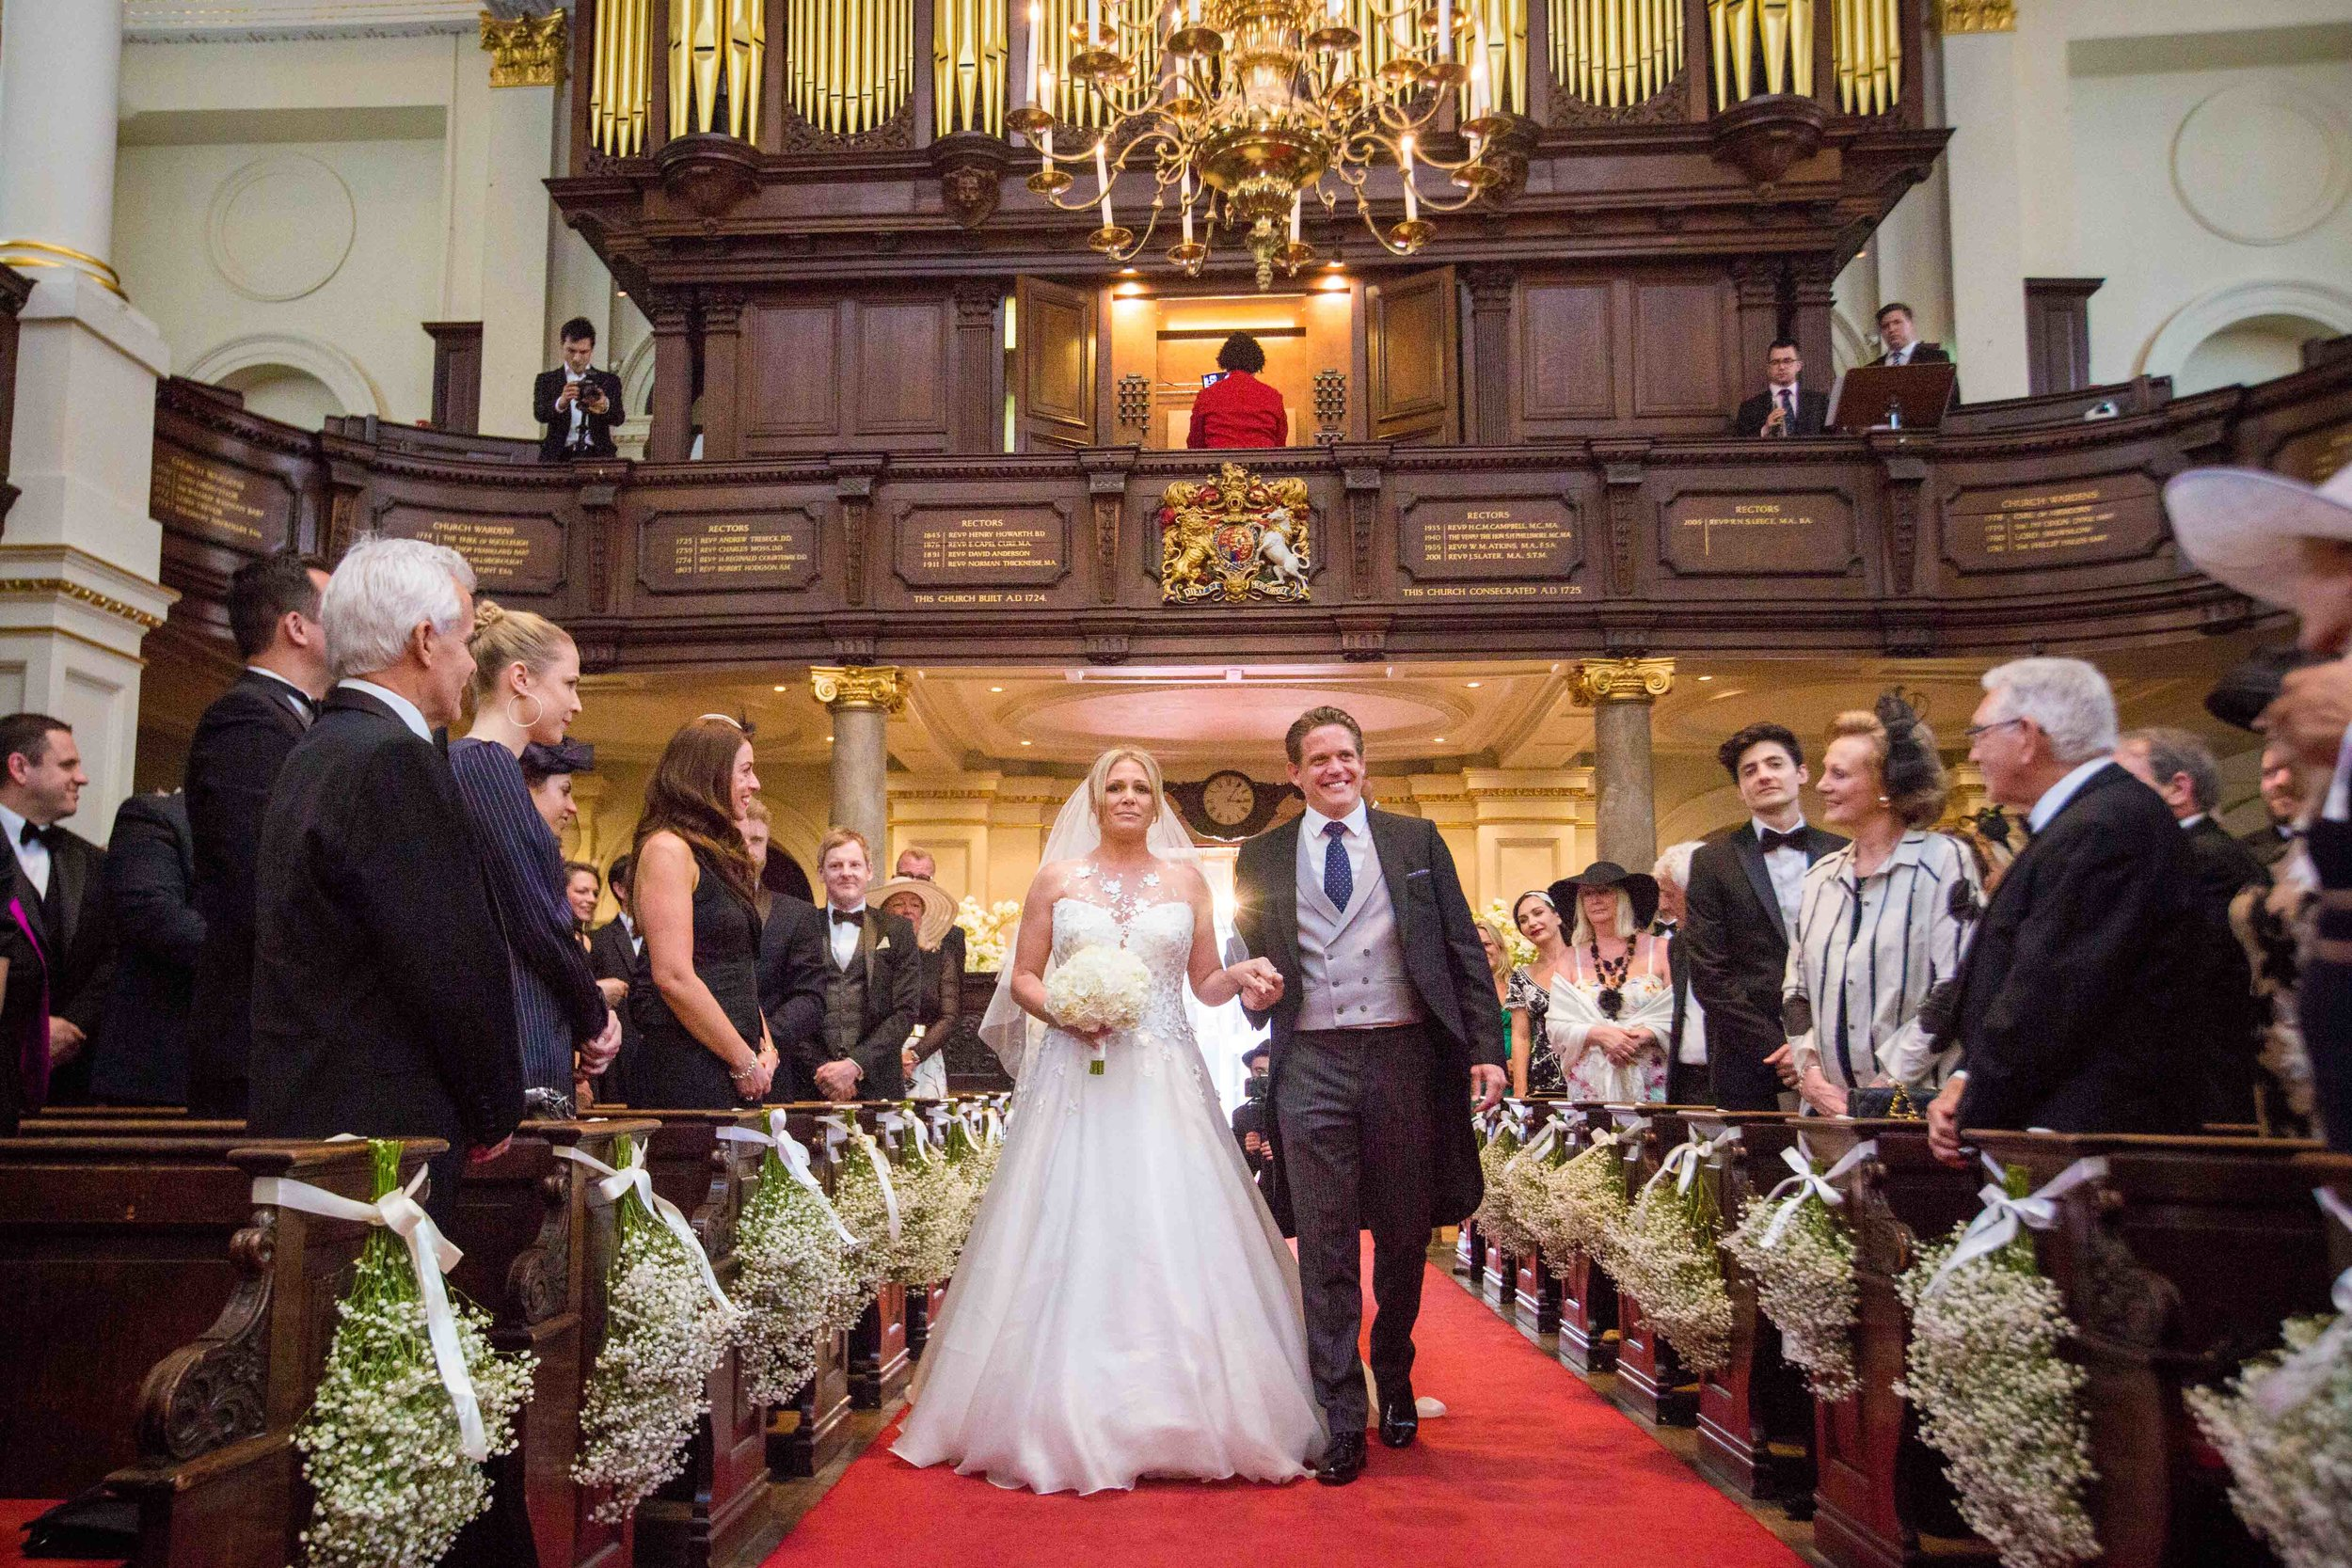 claridges-hotel-wedding-photographer-london-mayfair-natalia-smith-photography-55.jpg